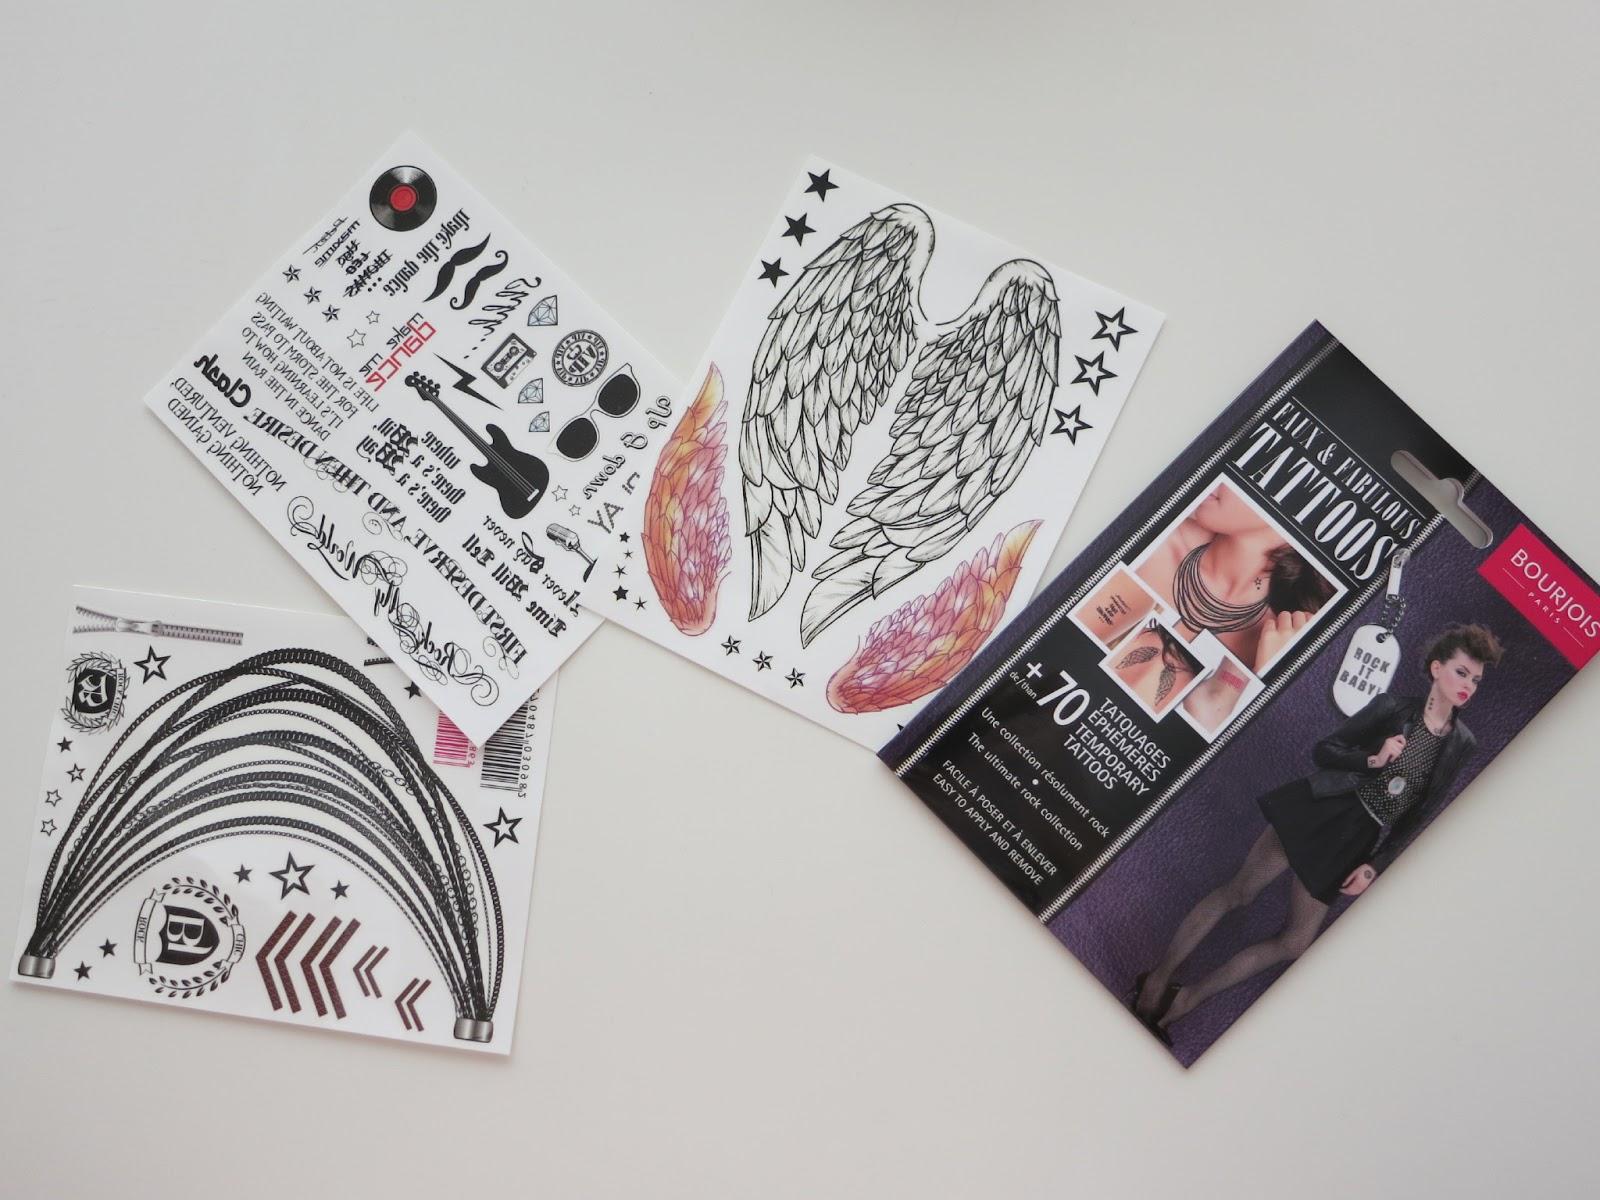 Bourjois sort un kit de tattoos éphémères madmoiZelle